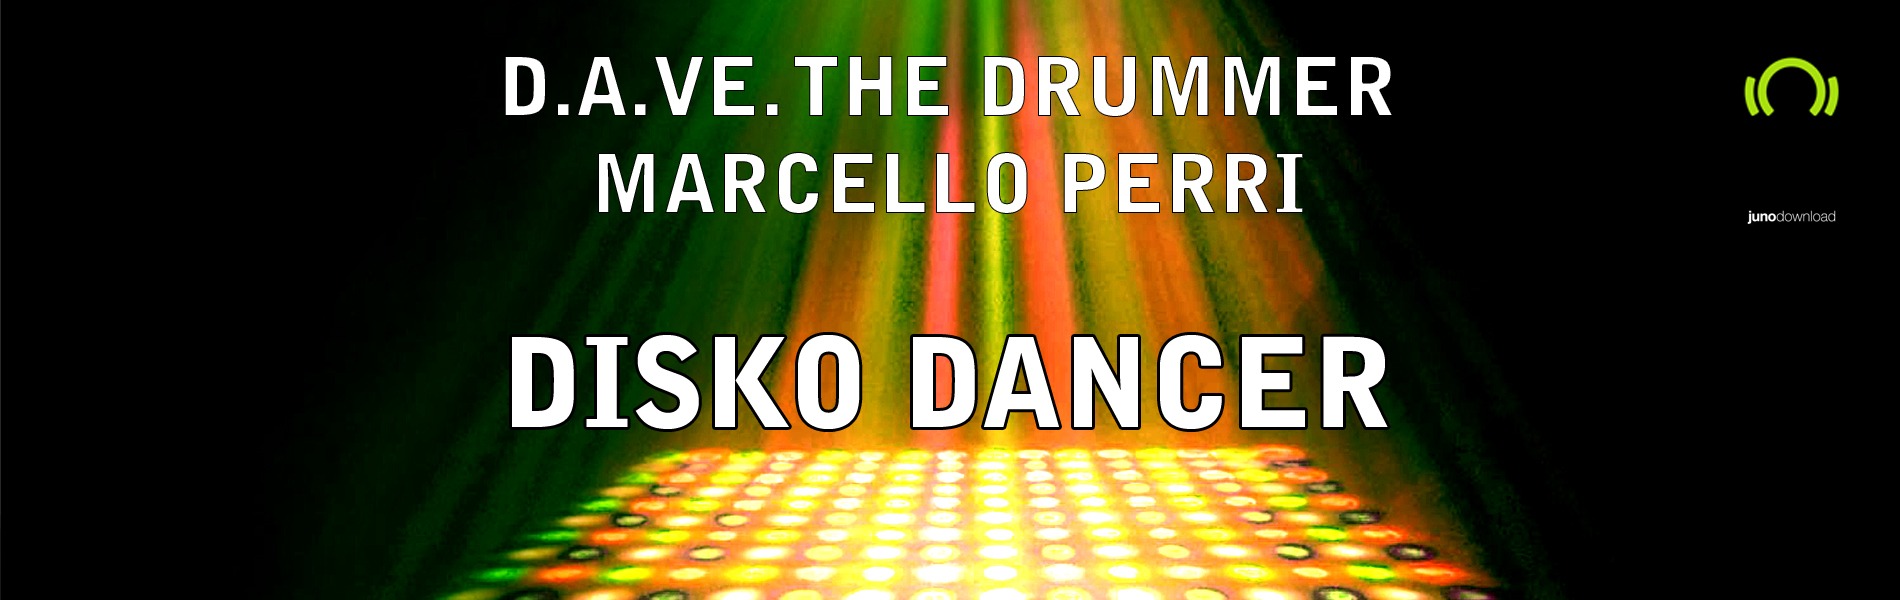 Disko-Dancer